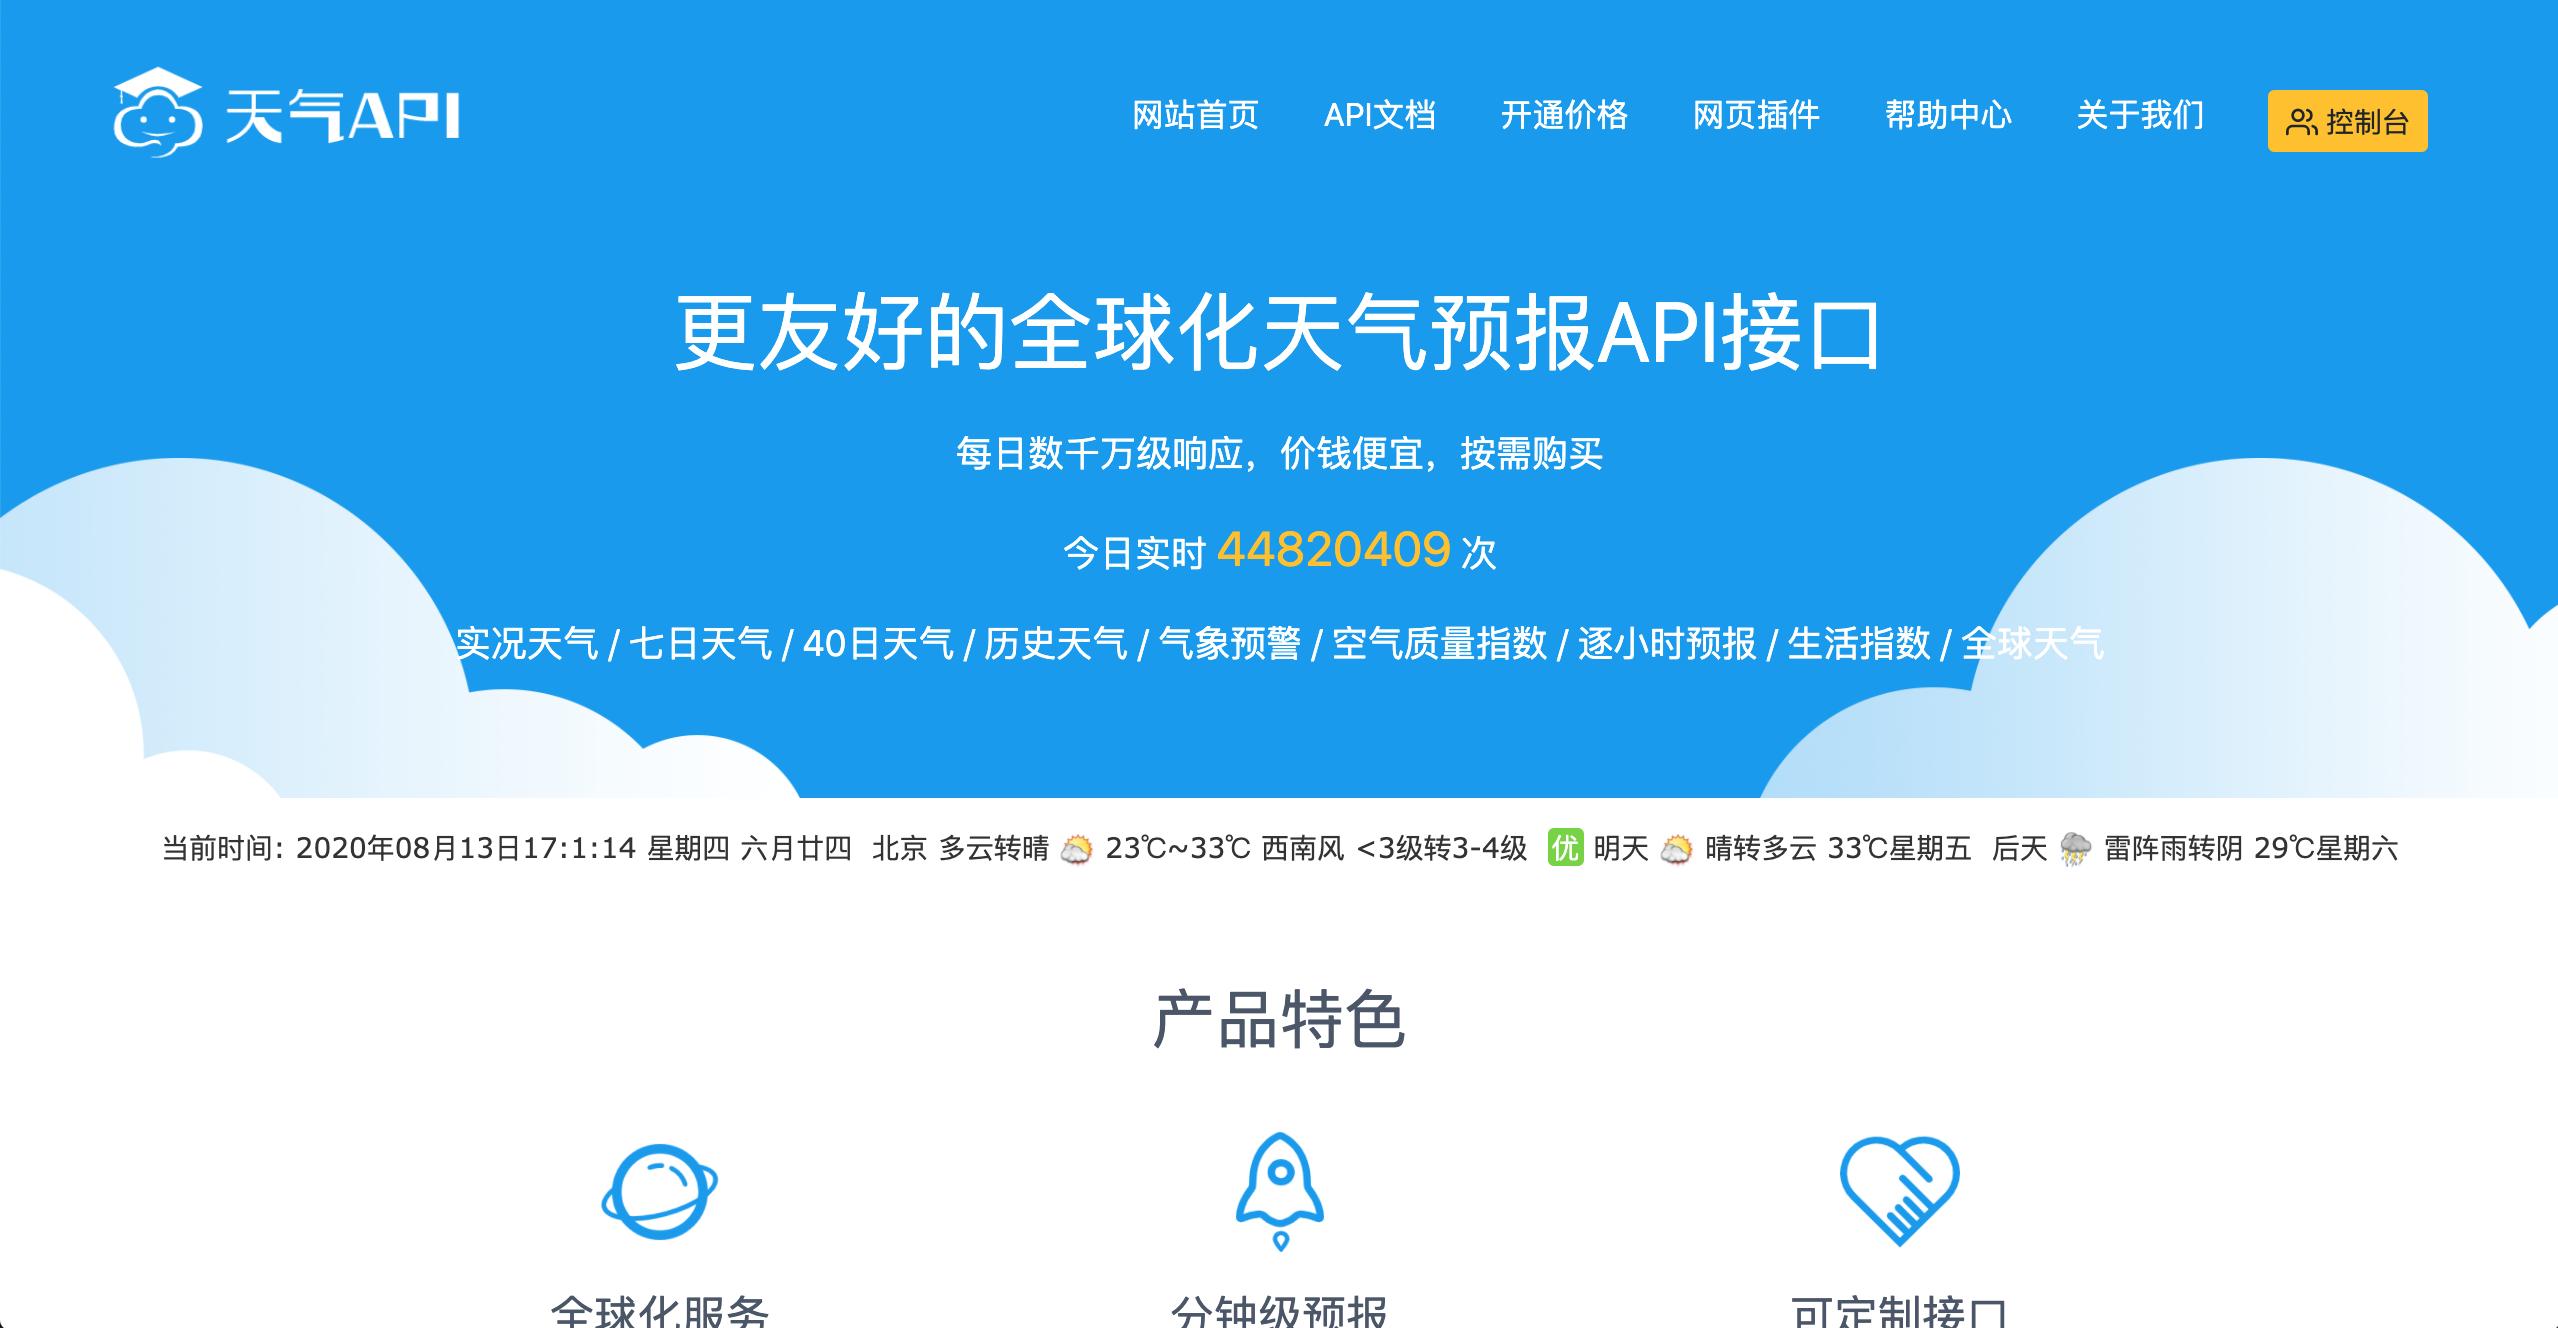 https://www.tianqiapi.com/index/doc